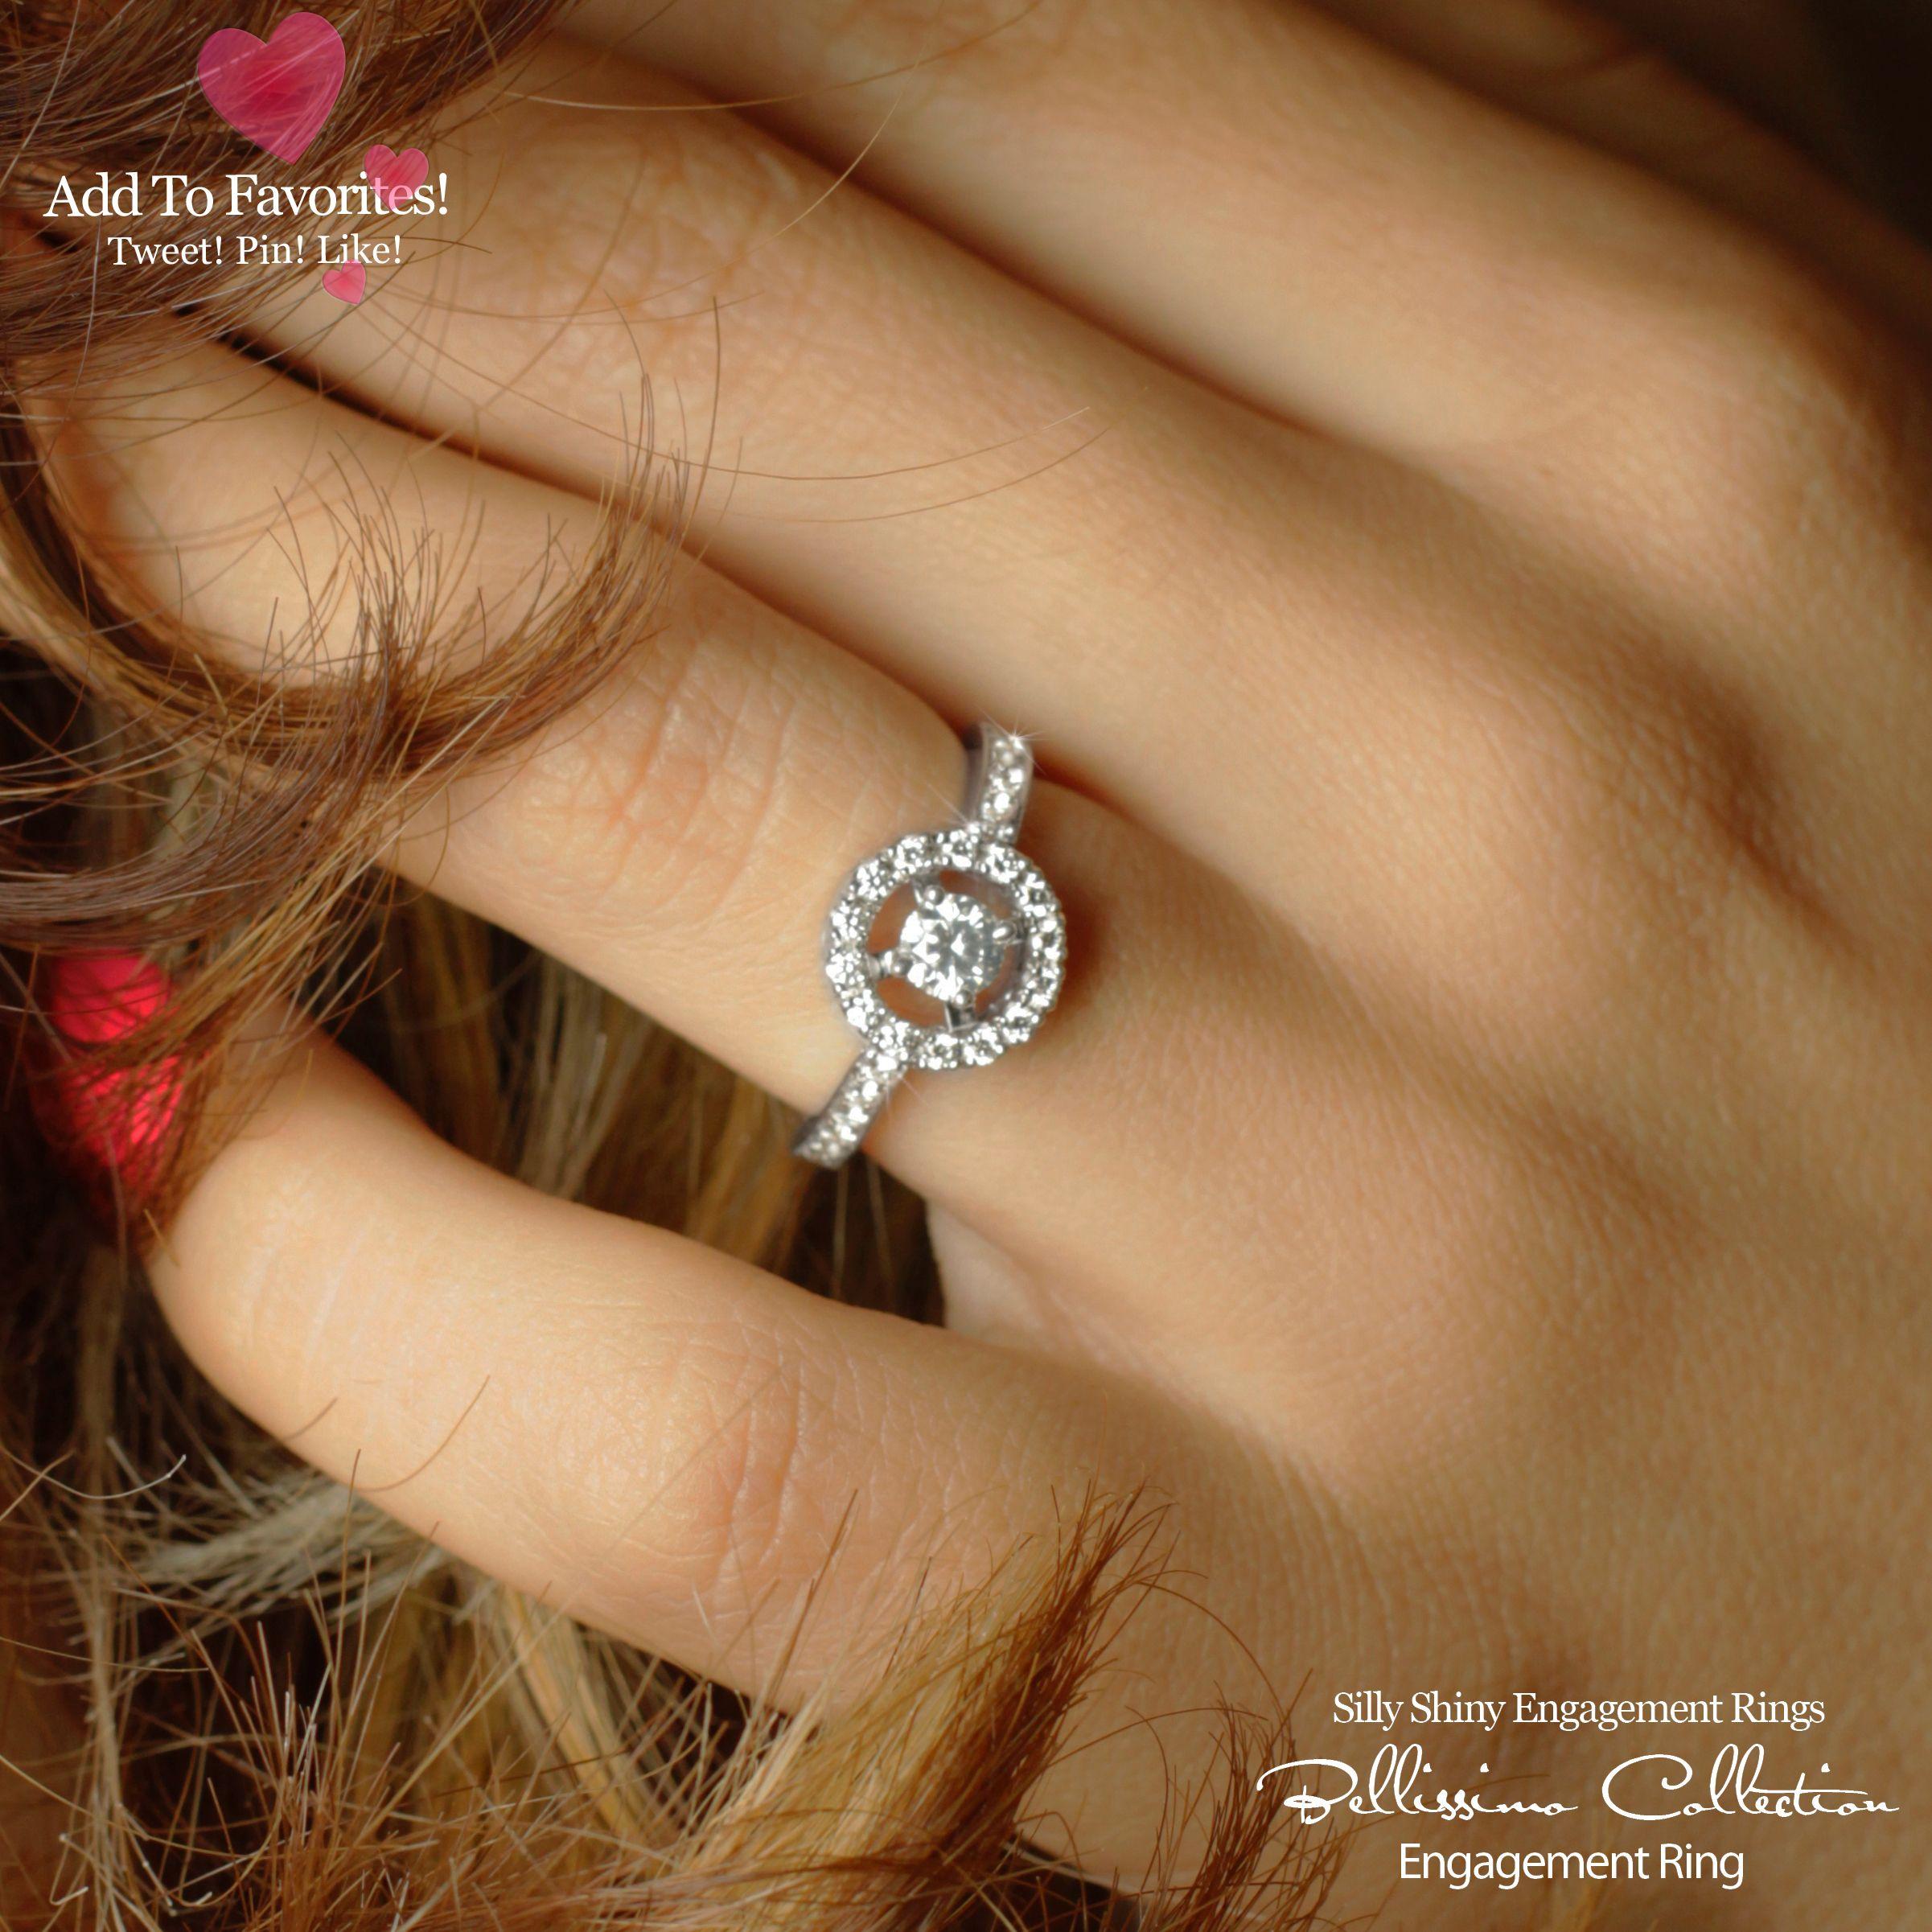 My dream engagement ring 3 Engagement rings Pinterest Dream